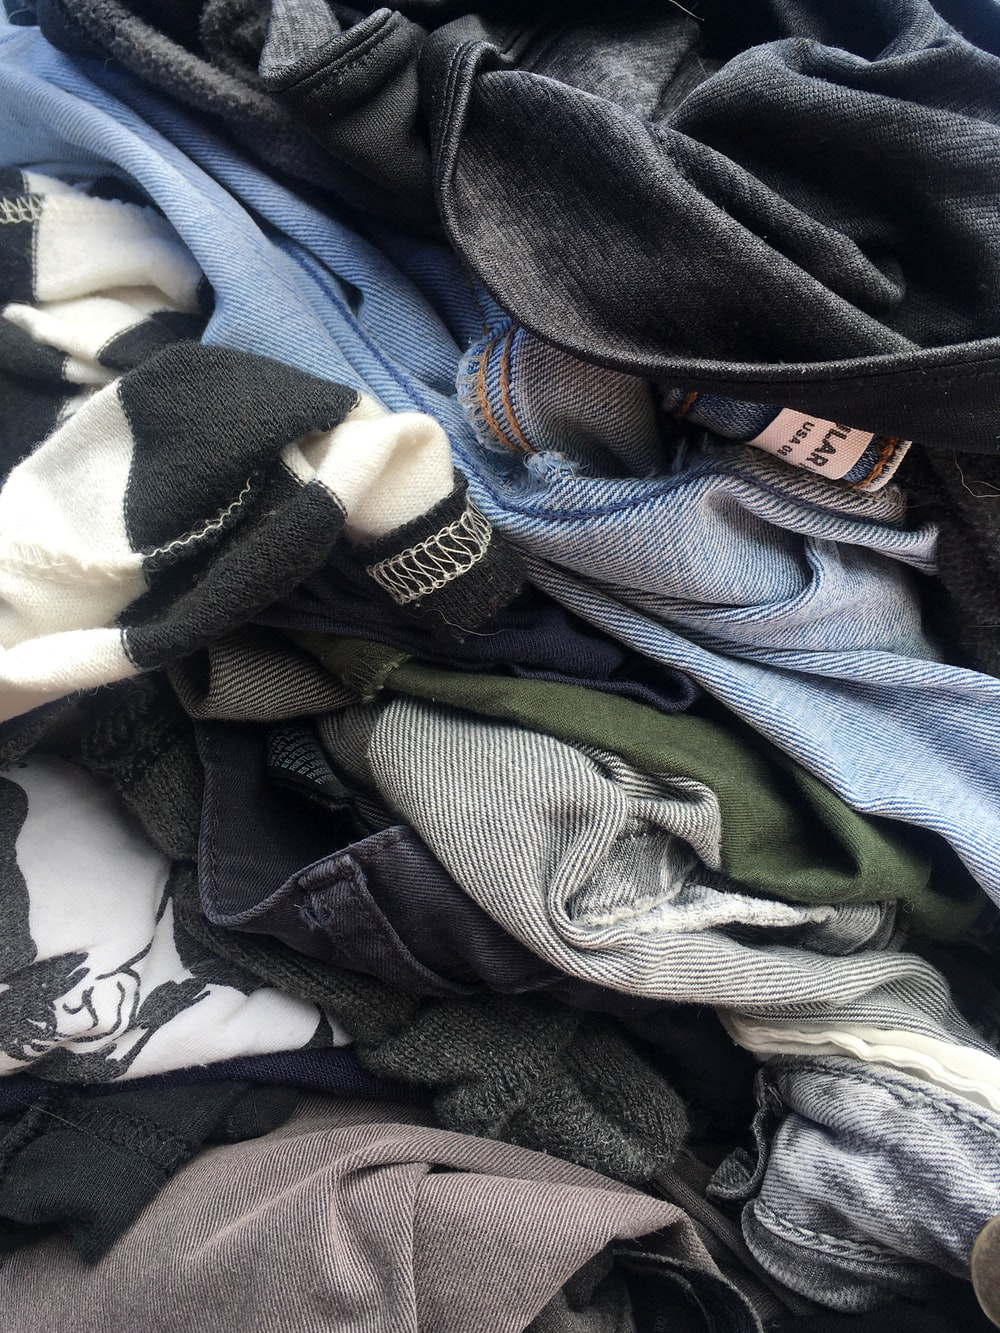 blue denim jeans on blue denim jeans